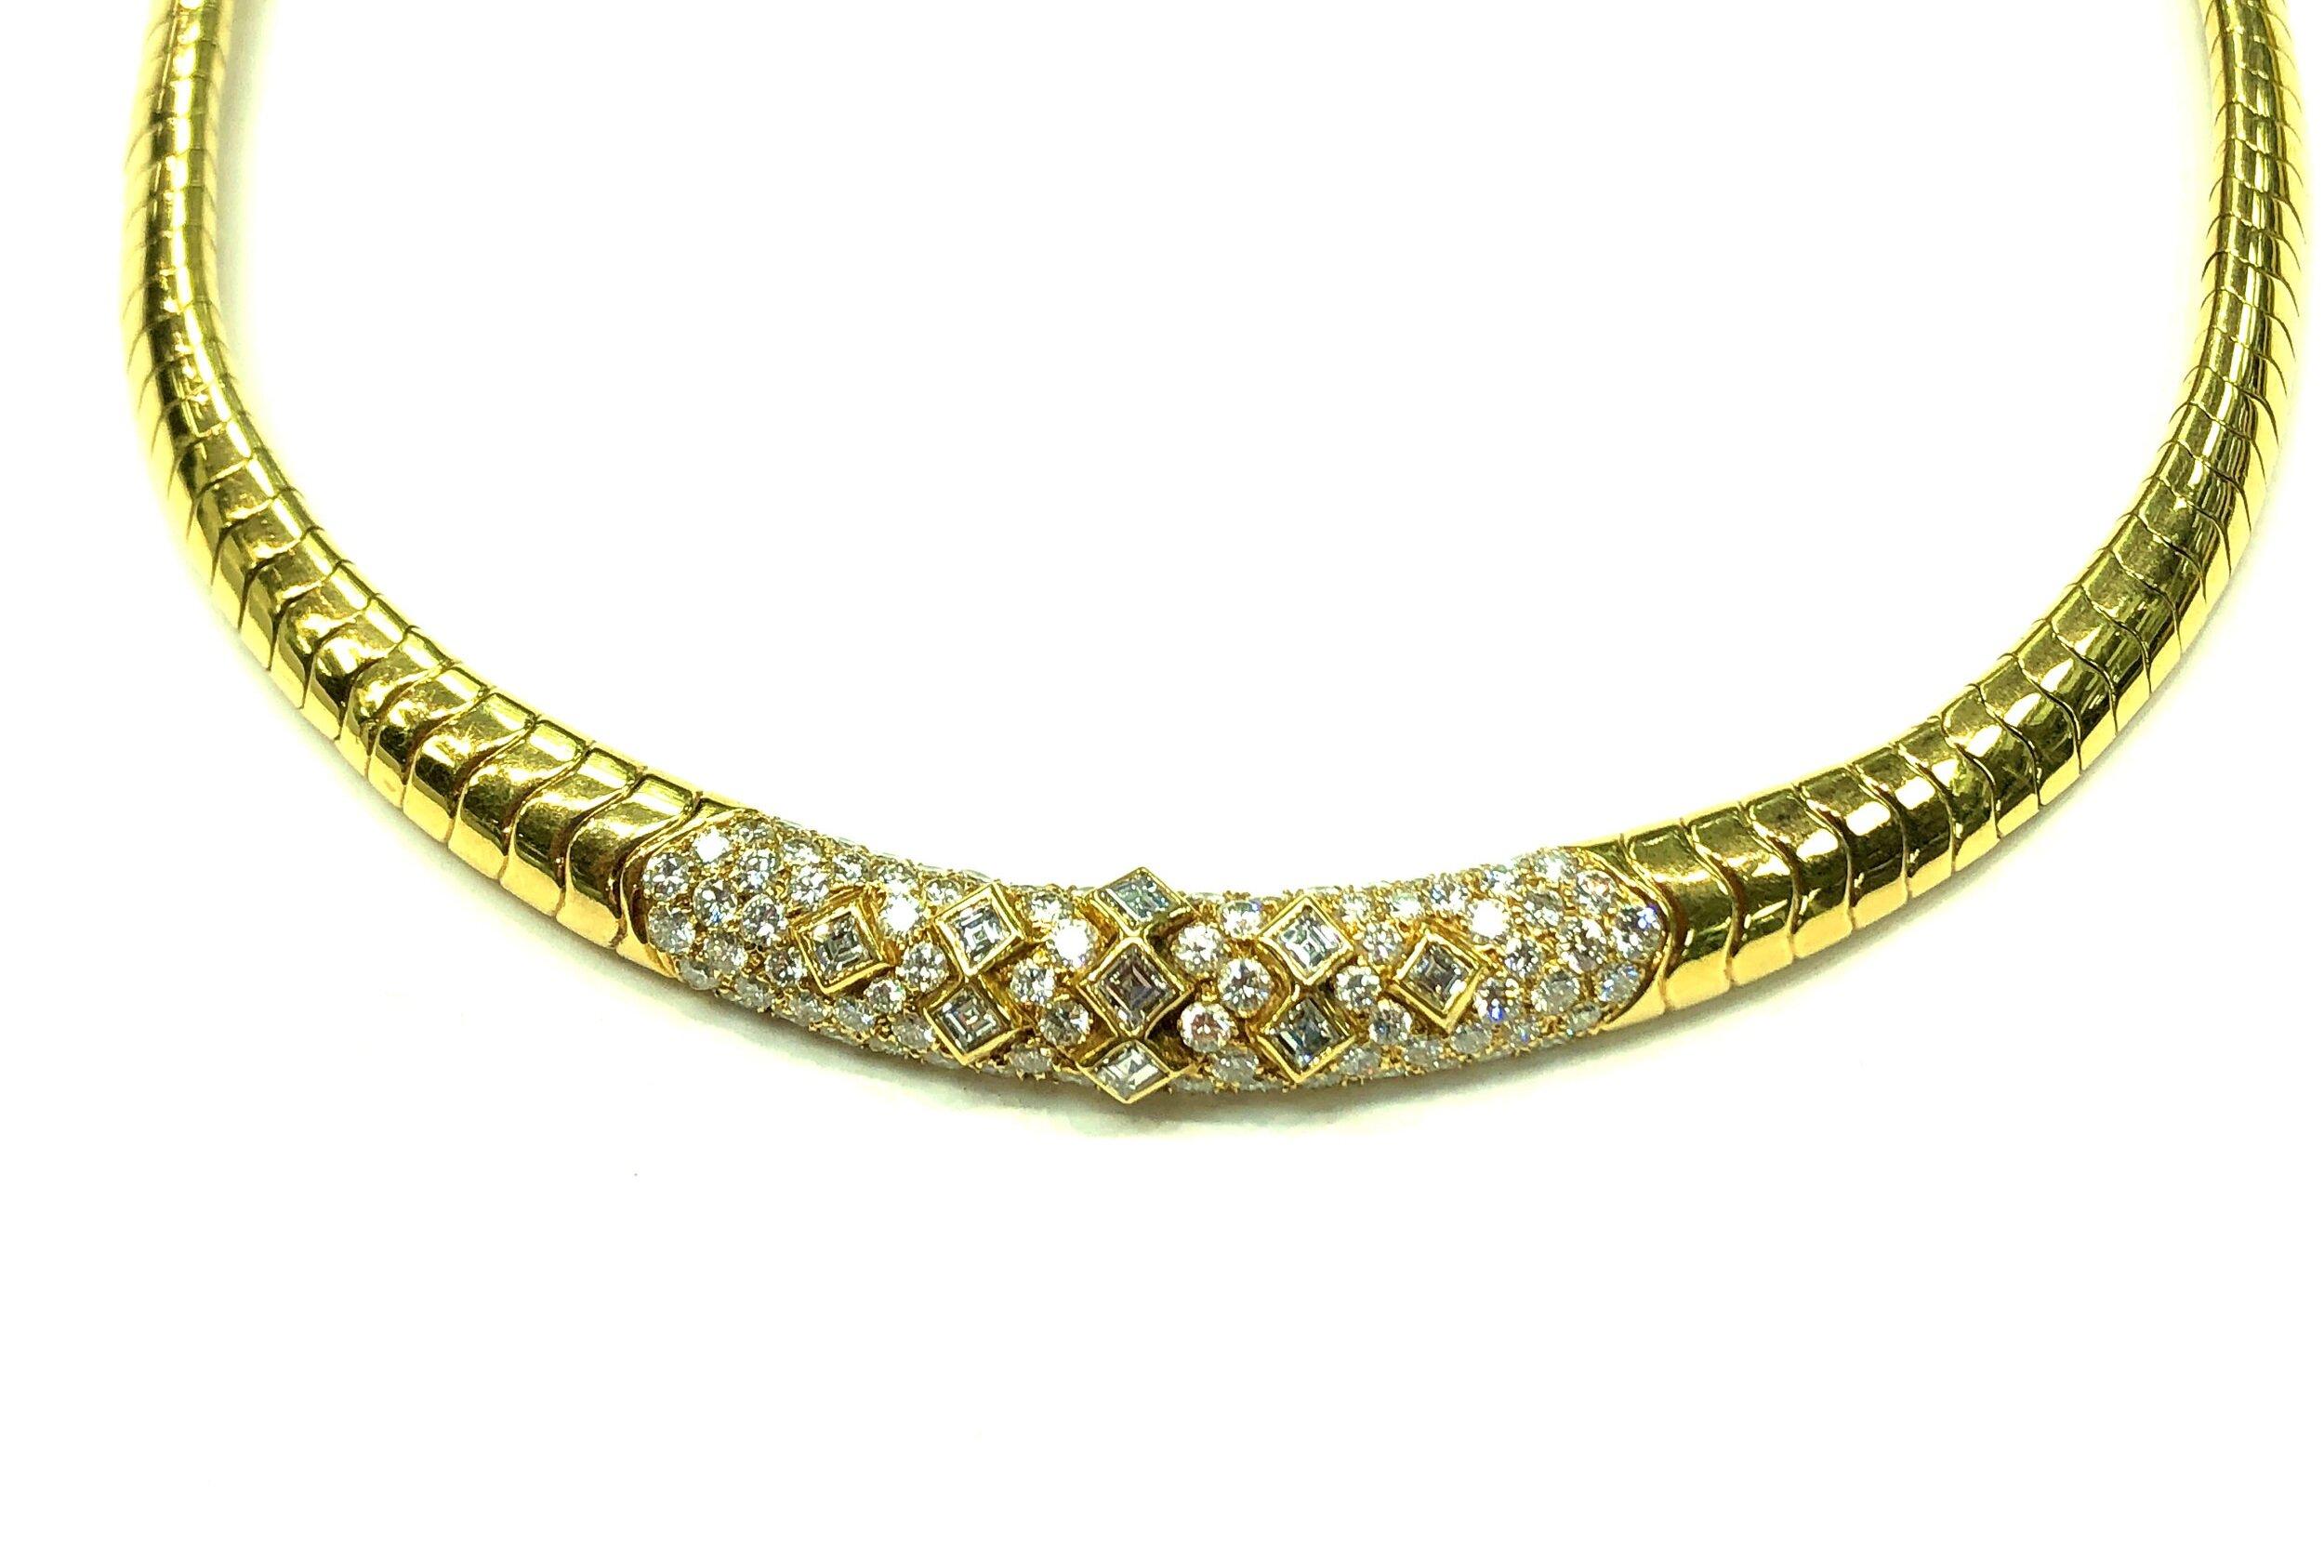 Diamond Center Necklace, 18kt Yellow Gold,  Van Cleef & Arpels   Est. US$ 15,000-18,000